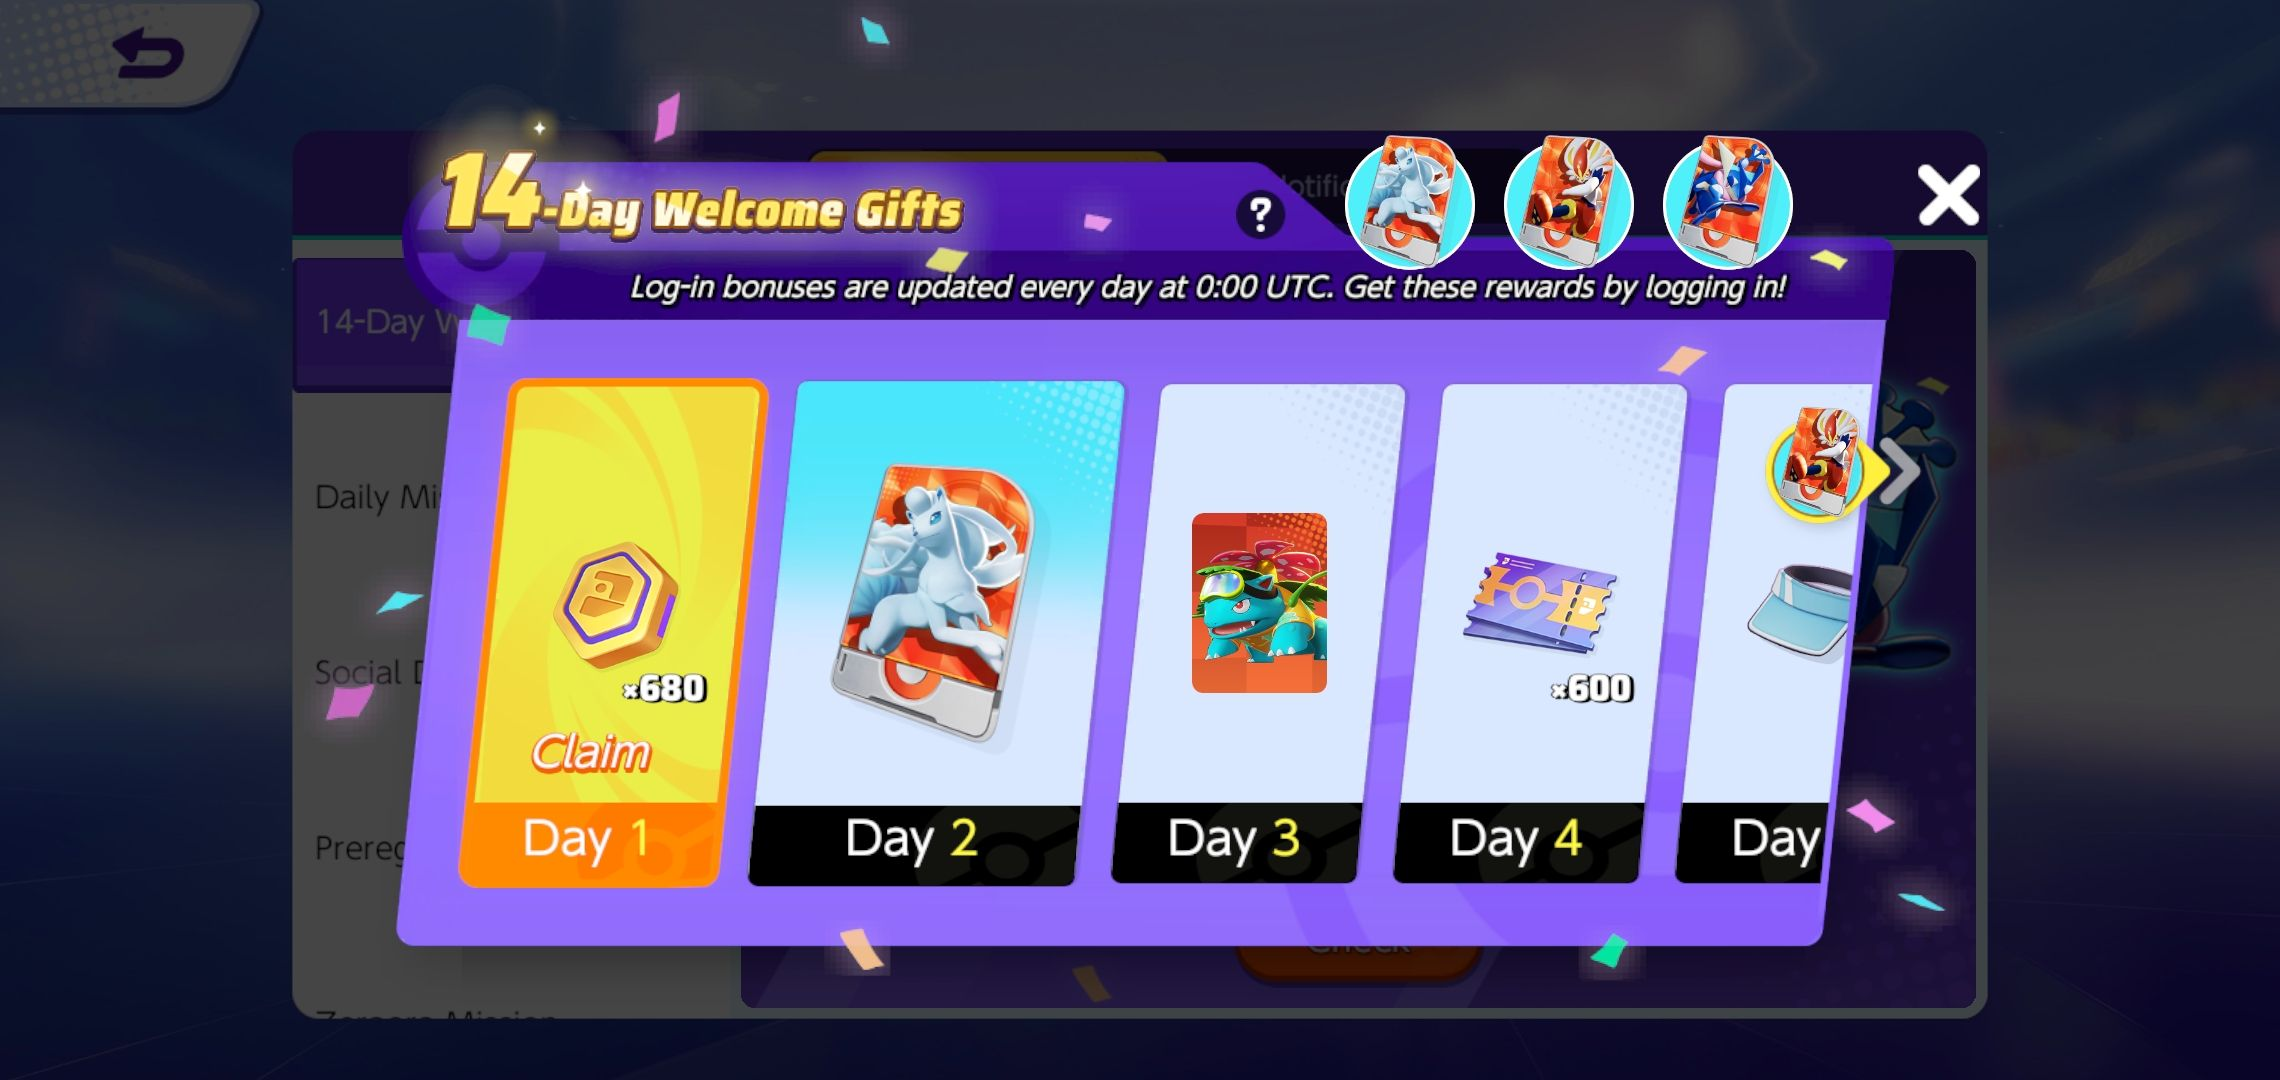 Pokemon Unite กิจกรรม 14-Day Welcome Gifts